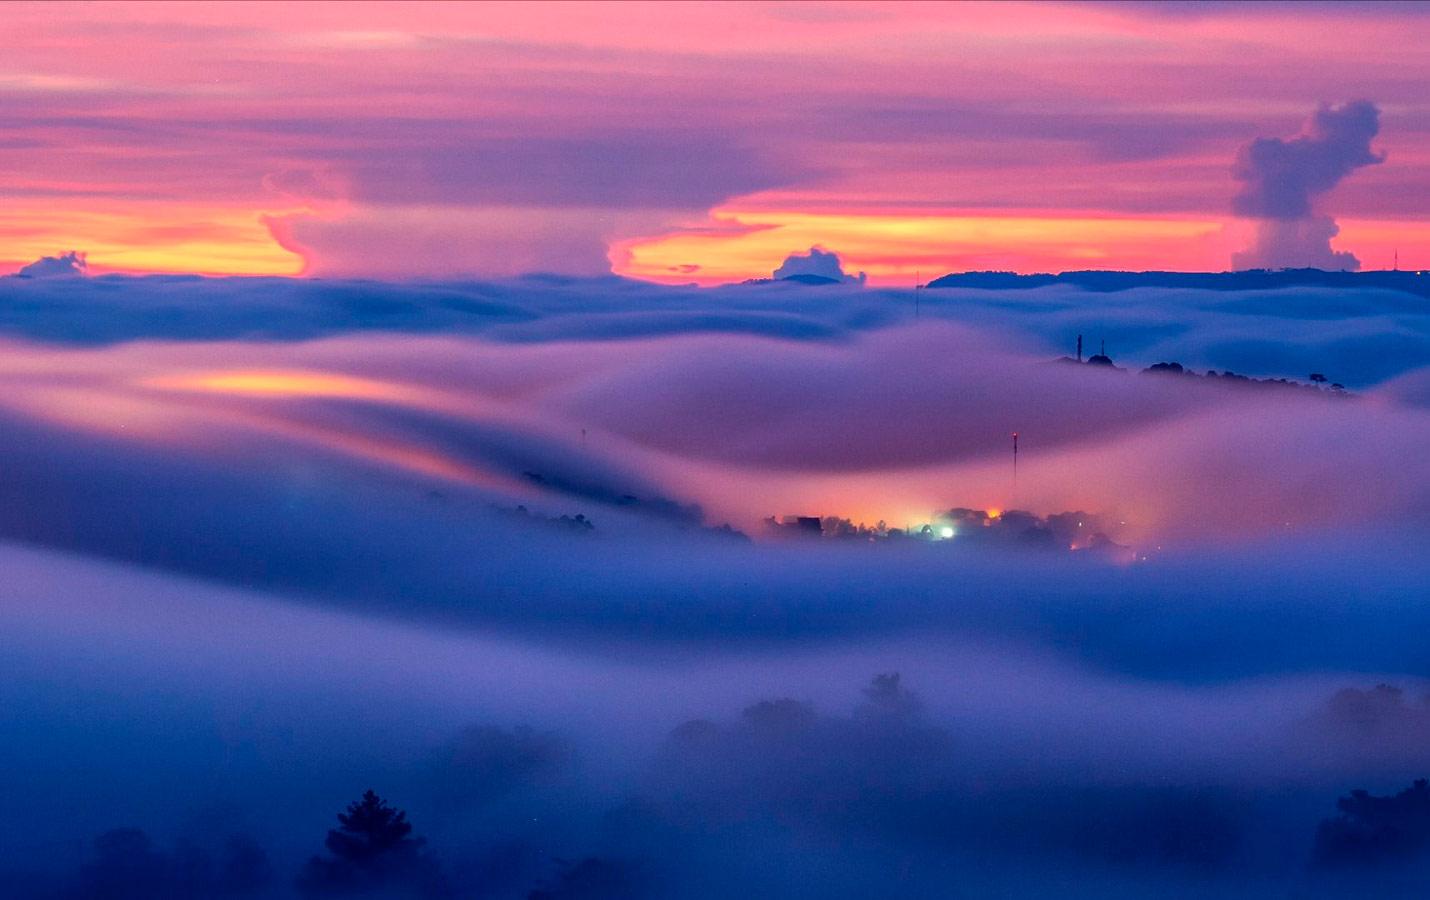 Туман–волна, © Хоанг Вьет Нгуен Фонг, Фотоконкурс «Погодный фотограф года» — Weather Photographer of the Year